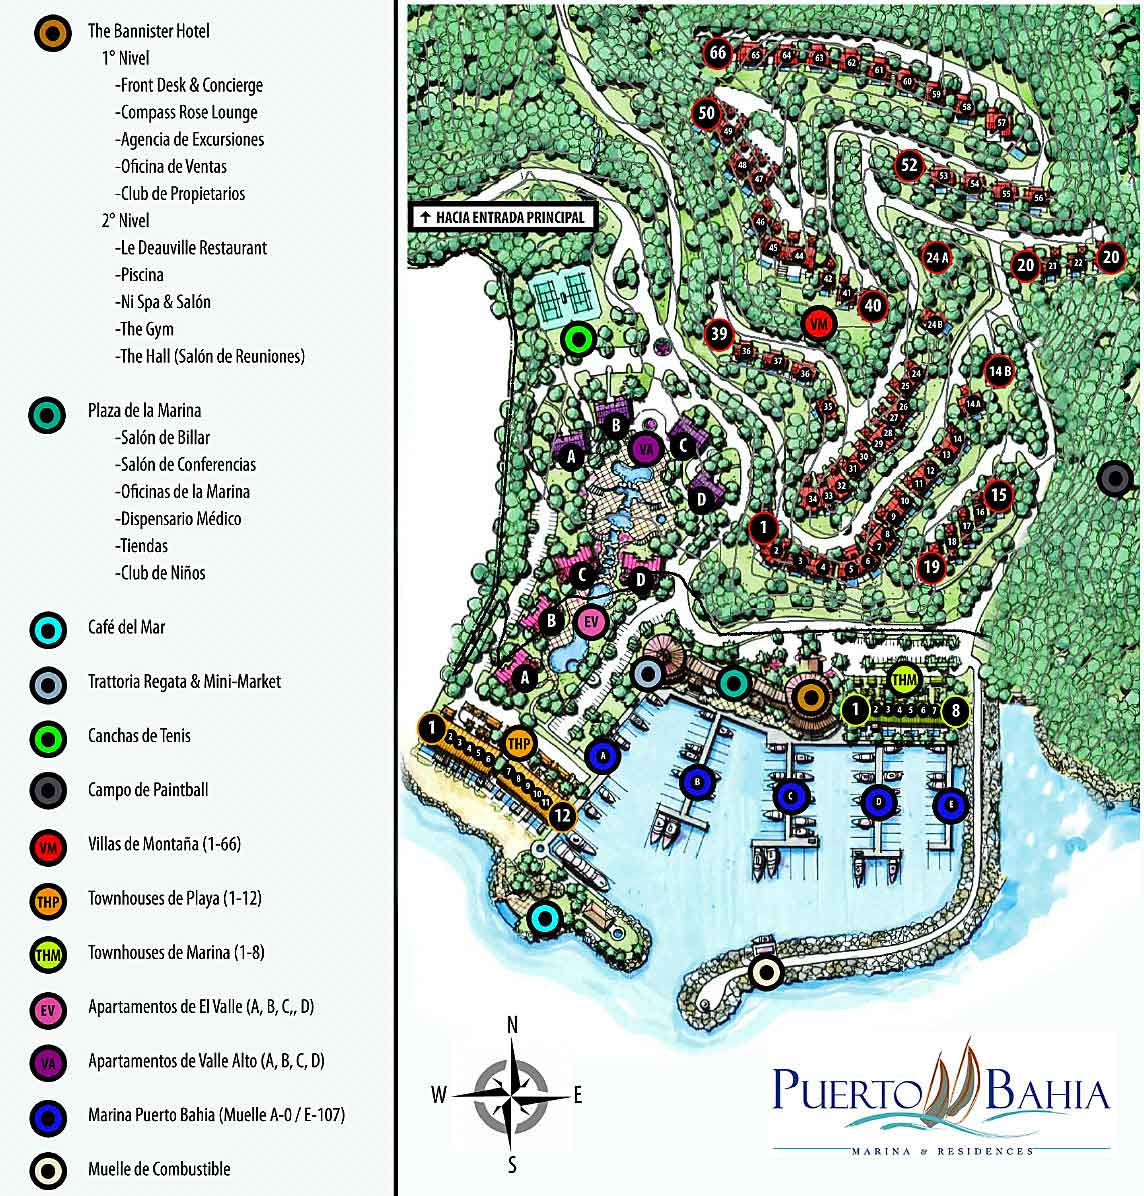 puerto-bahia-marina-and-residences-site-plan